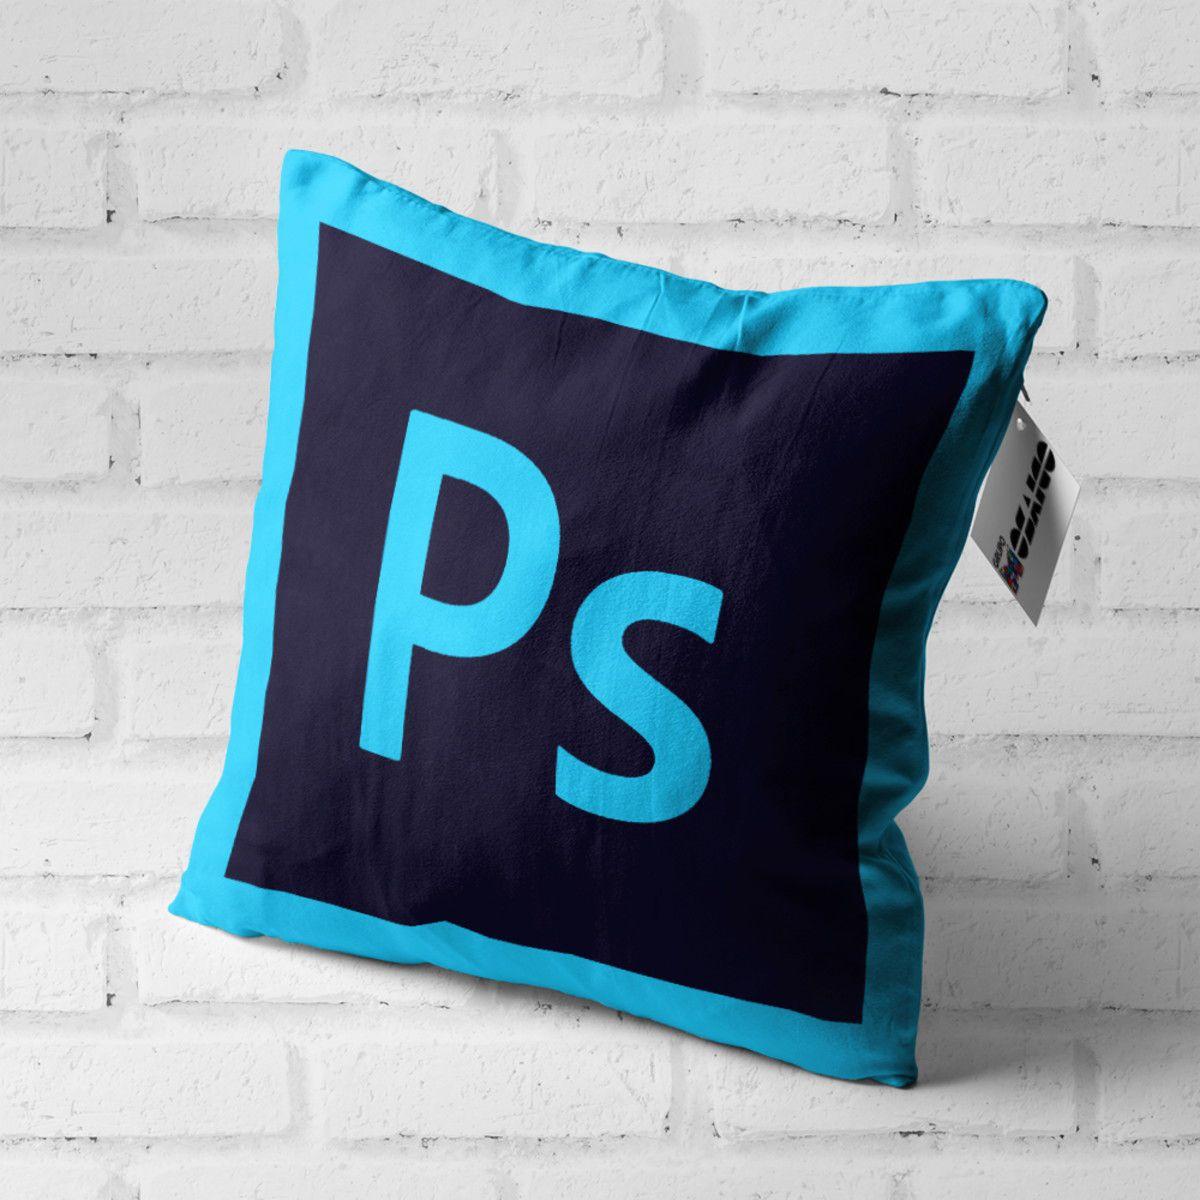 ALMOFADA SUBLIMADA - Adobe Photoshop